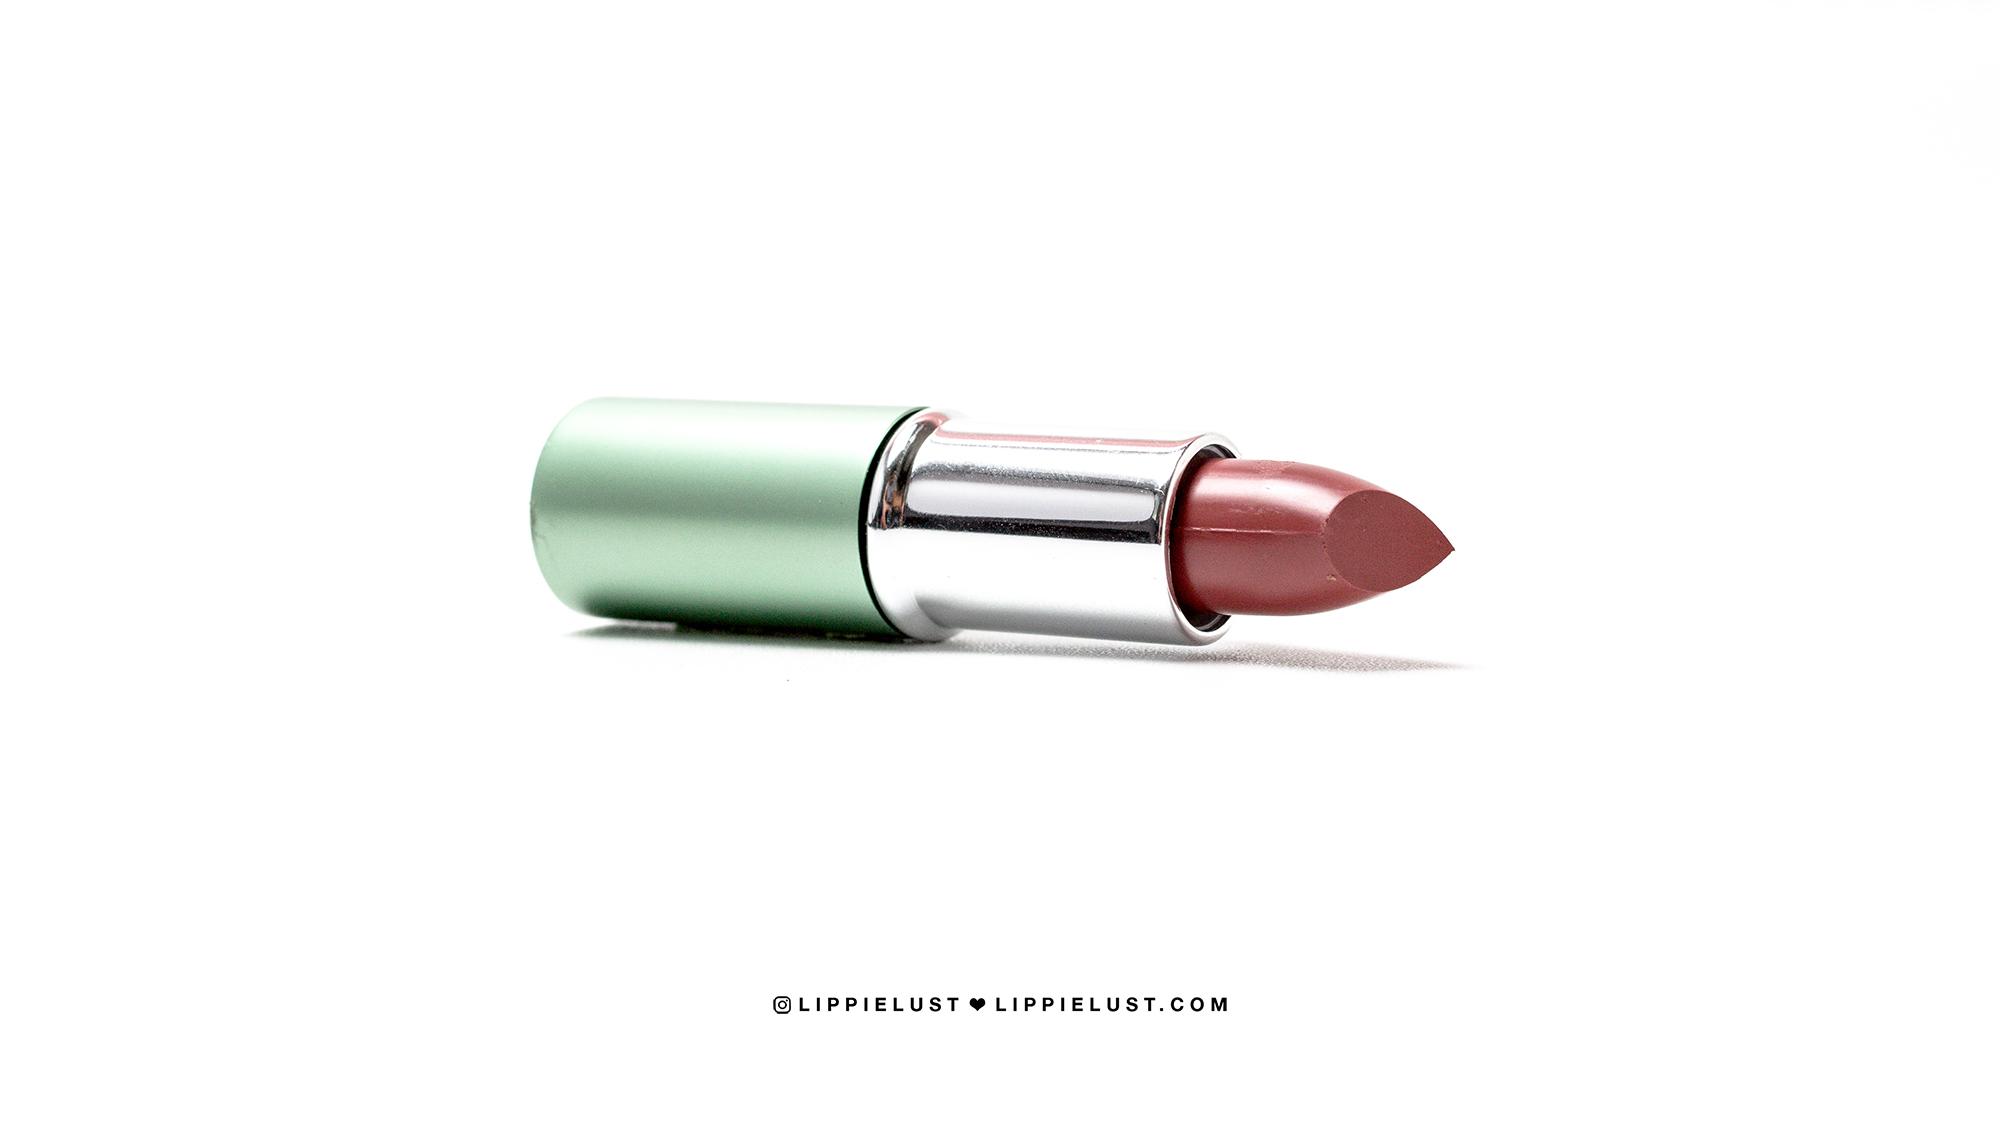 [SWATCH & REVIEW] Wardah Beauty Long Lasting Lipstick